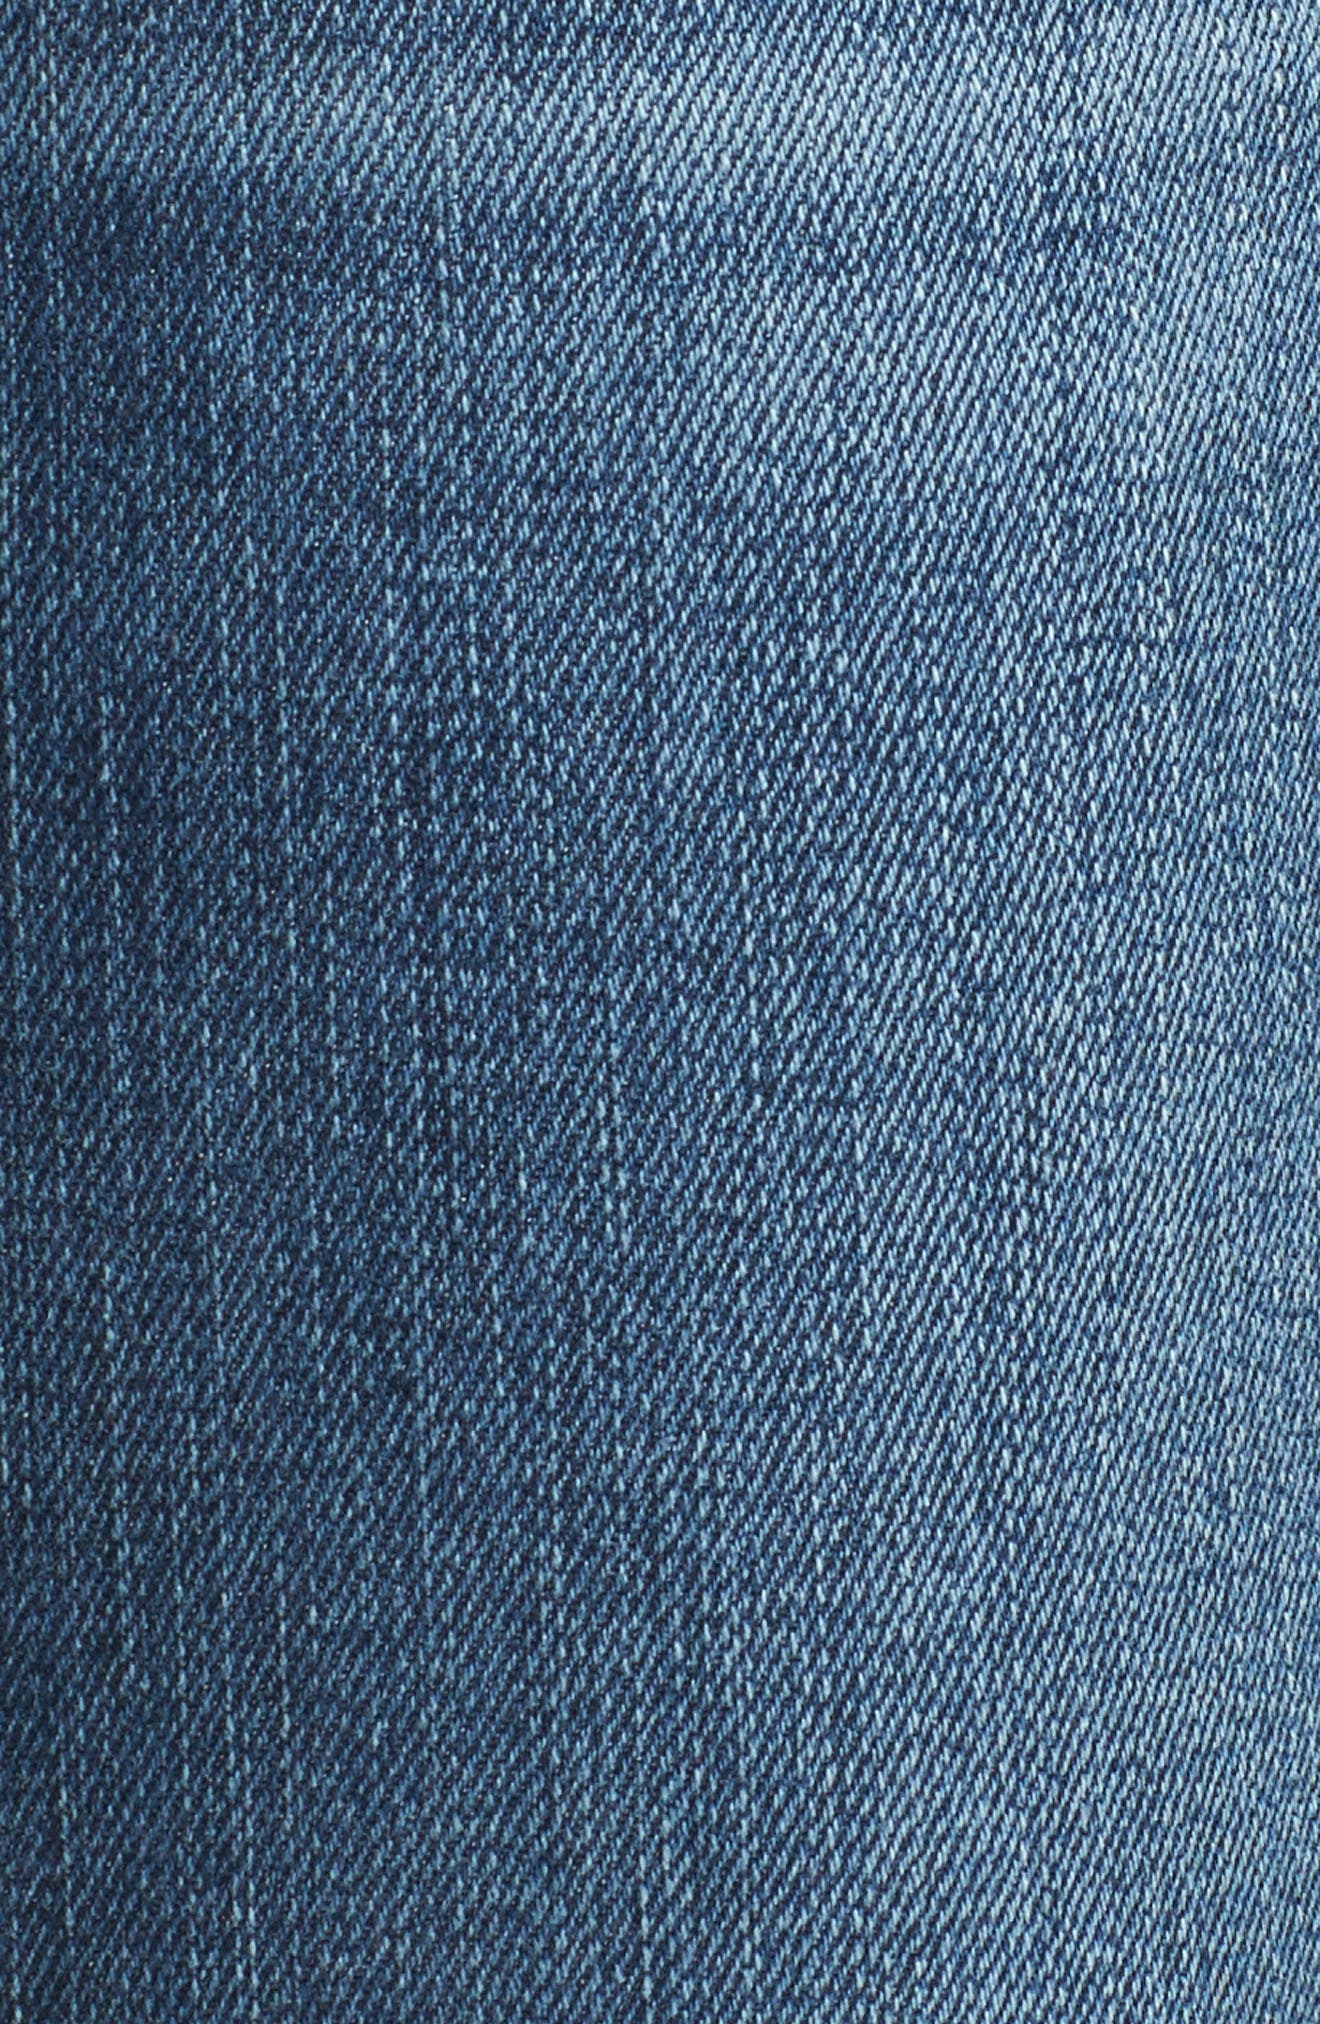 Lola Ripped Skinny Jeans,                             Alternate thumbnail 5, color,                             400